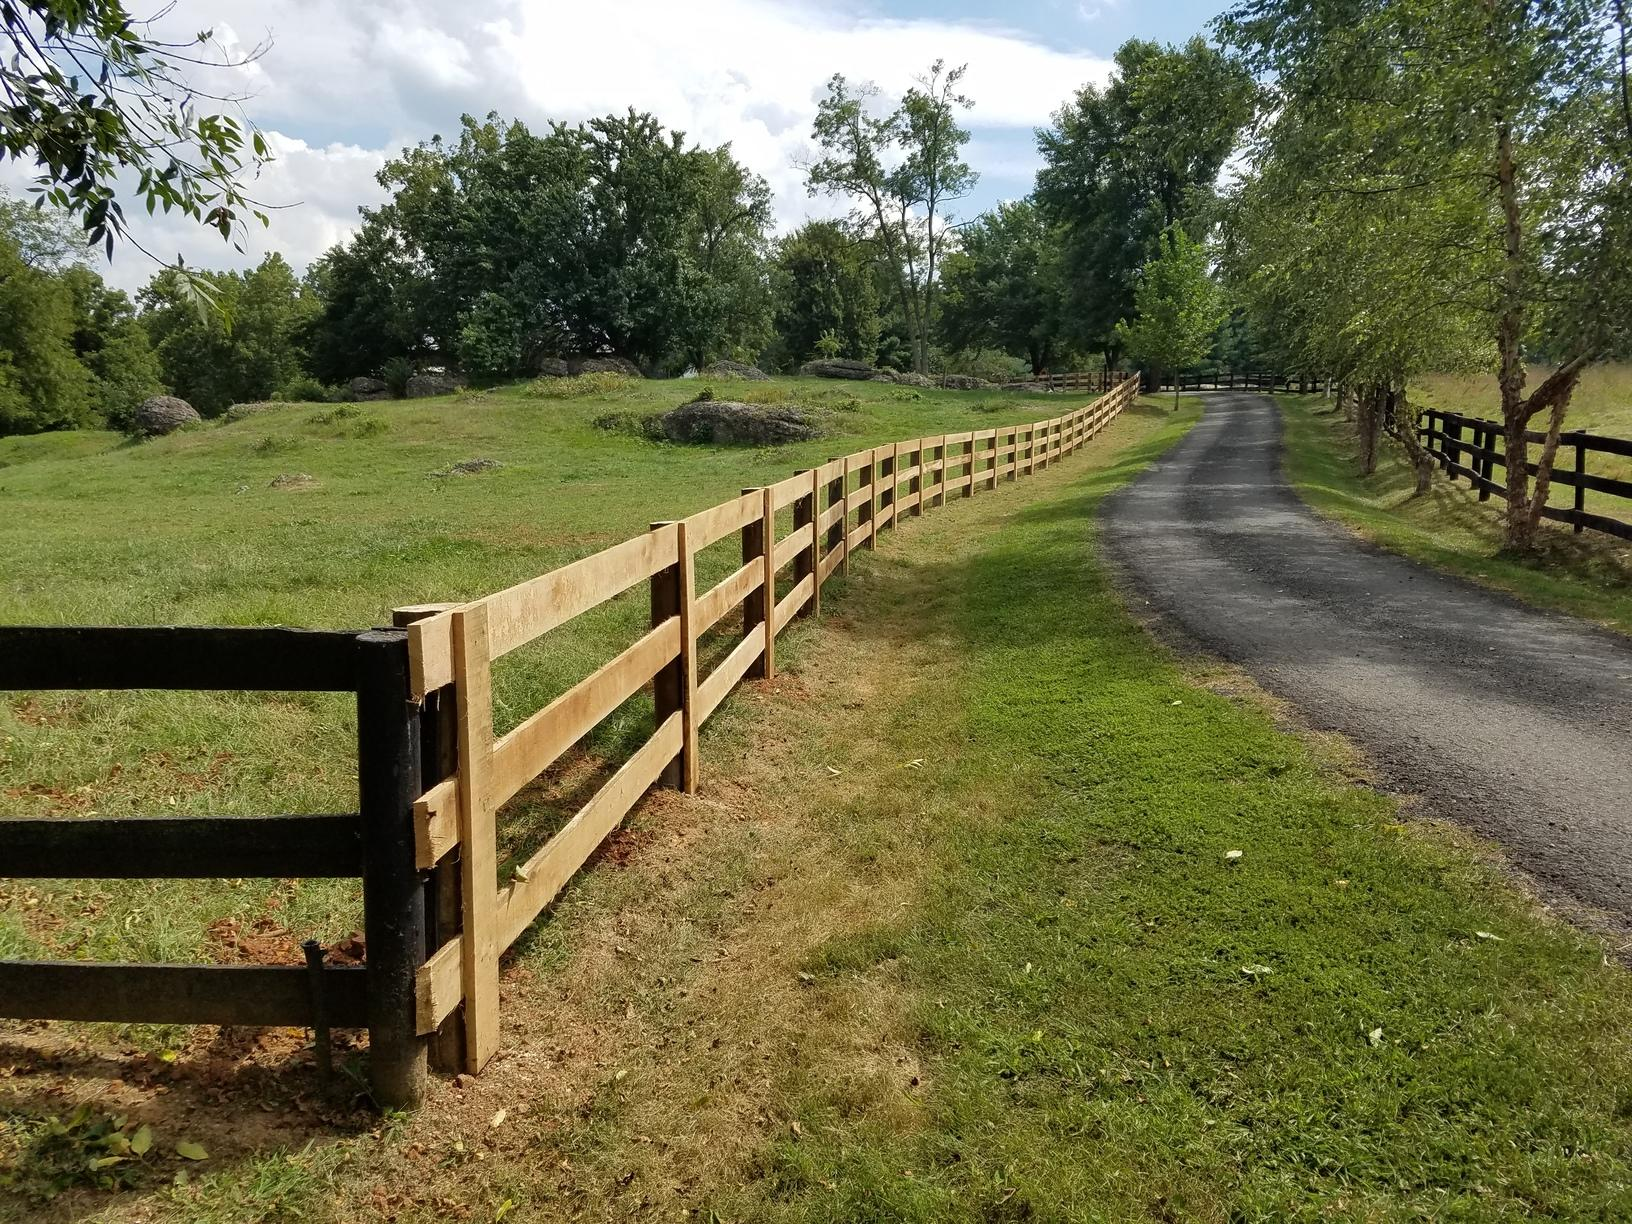 Paddock Fence installation, Hamilton, VA - After Photo